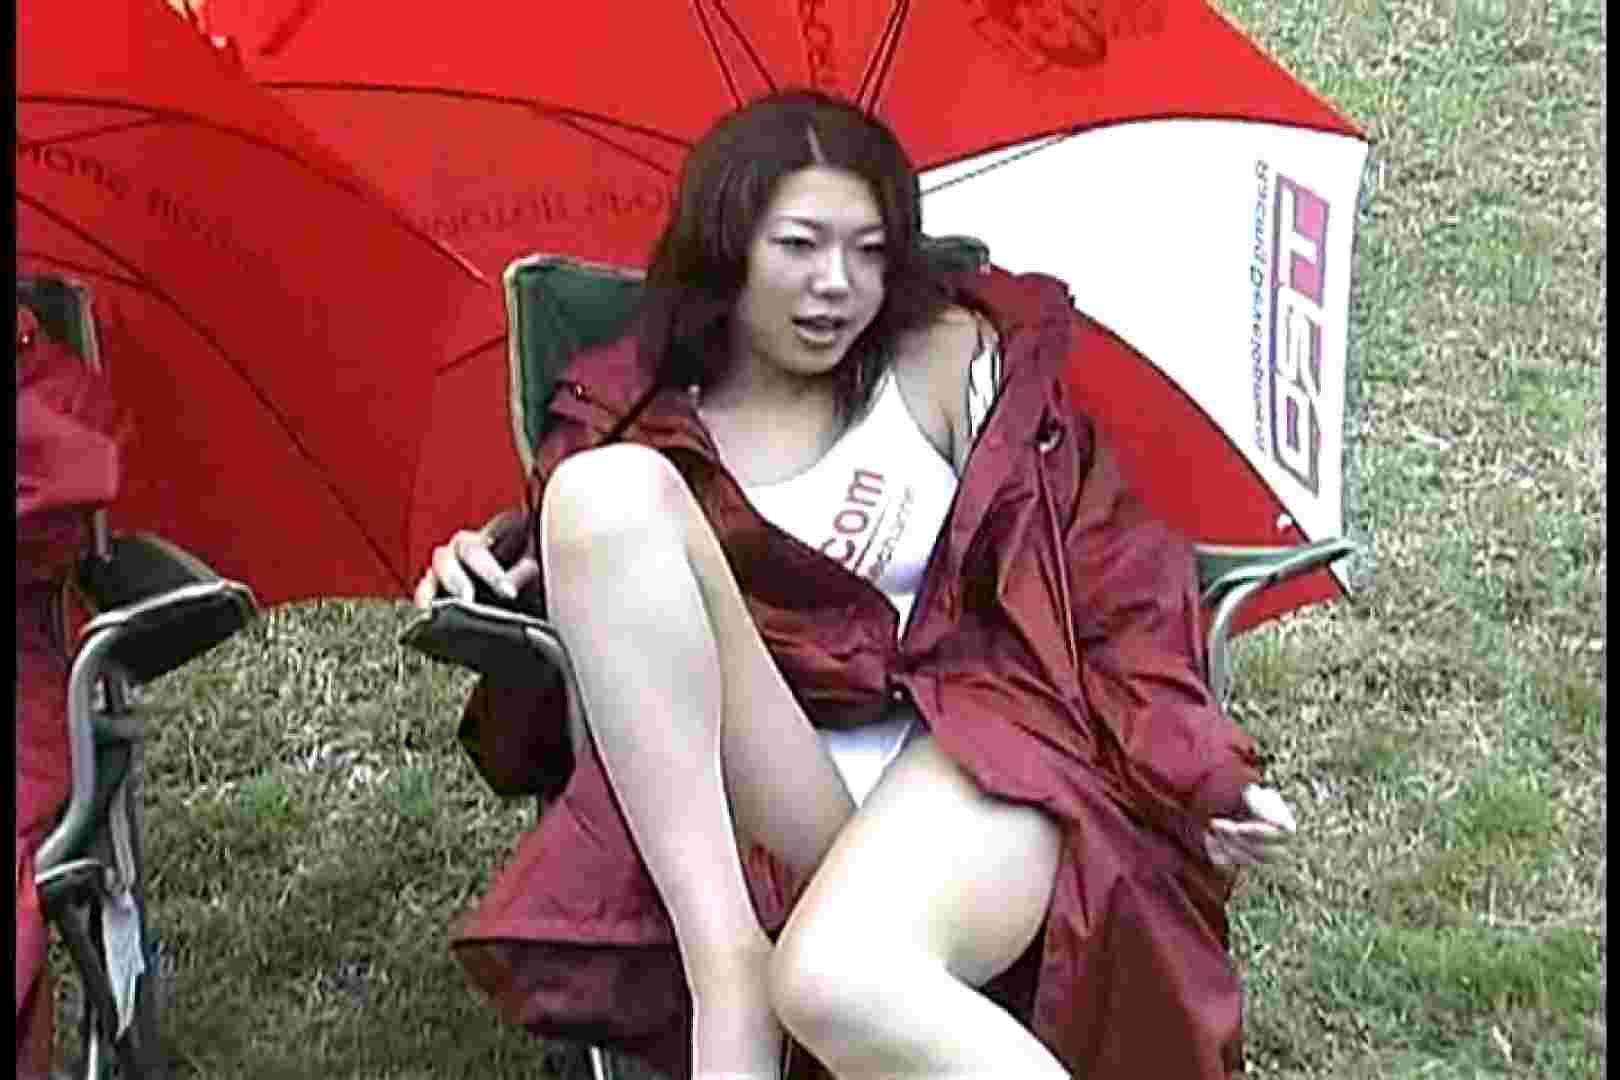 RQカメラ地獄Vol.3 レースクイーン編 ワレメ動画紹介 79画像 77